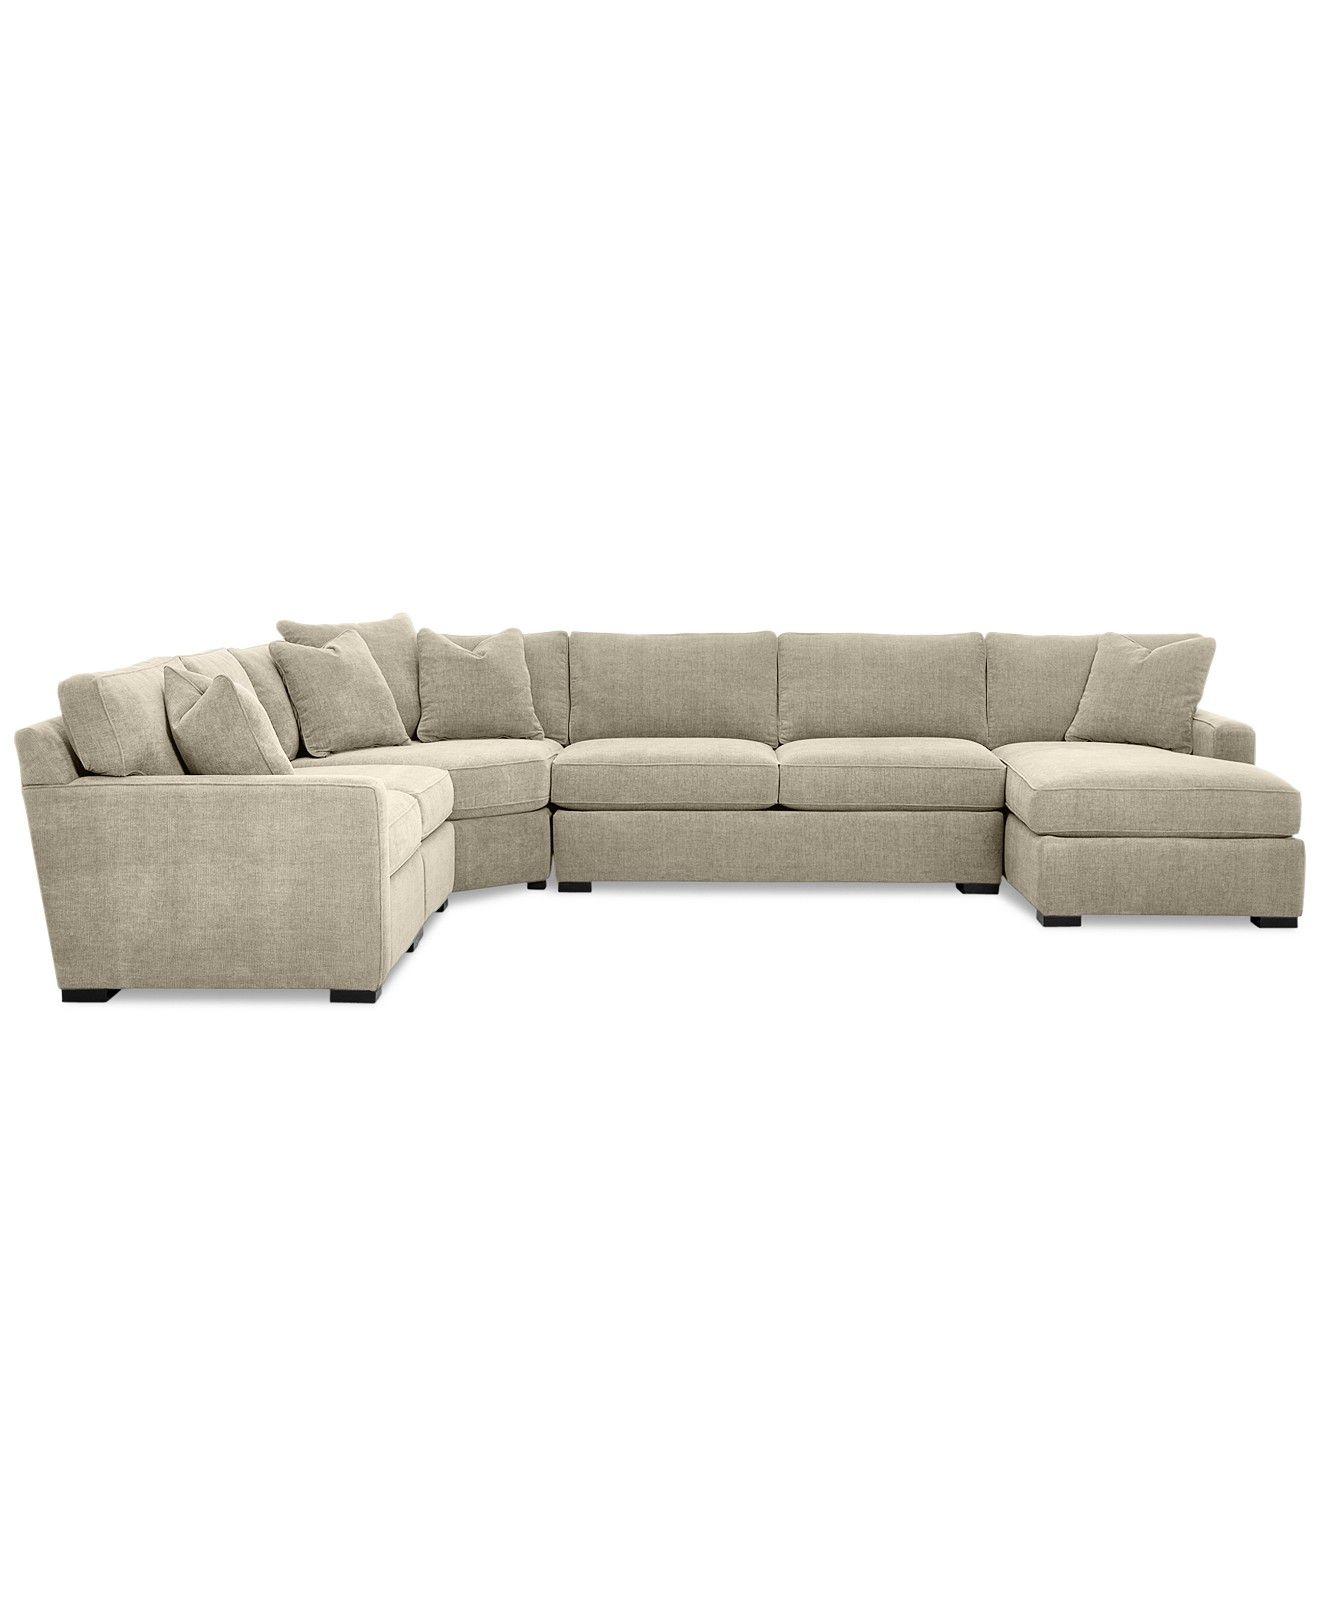 Macys Sectional Sofa Microfiber Rowe Hartford Slipcover Radley 5 Piece Fabric Chaise Created For